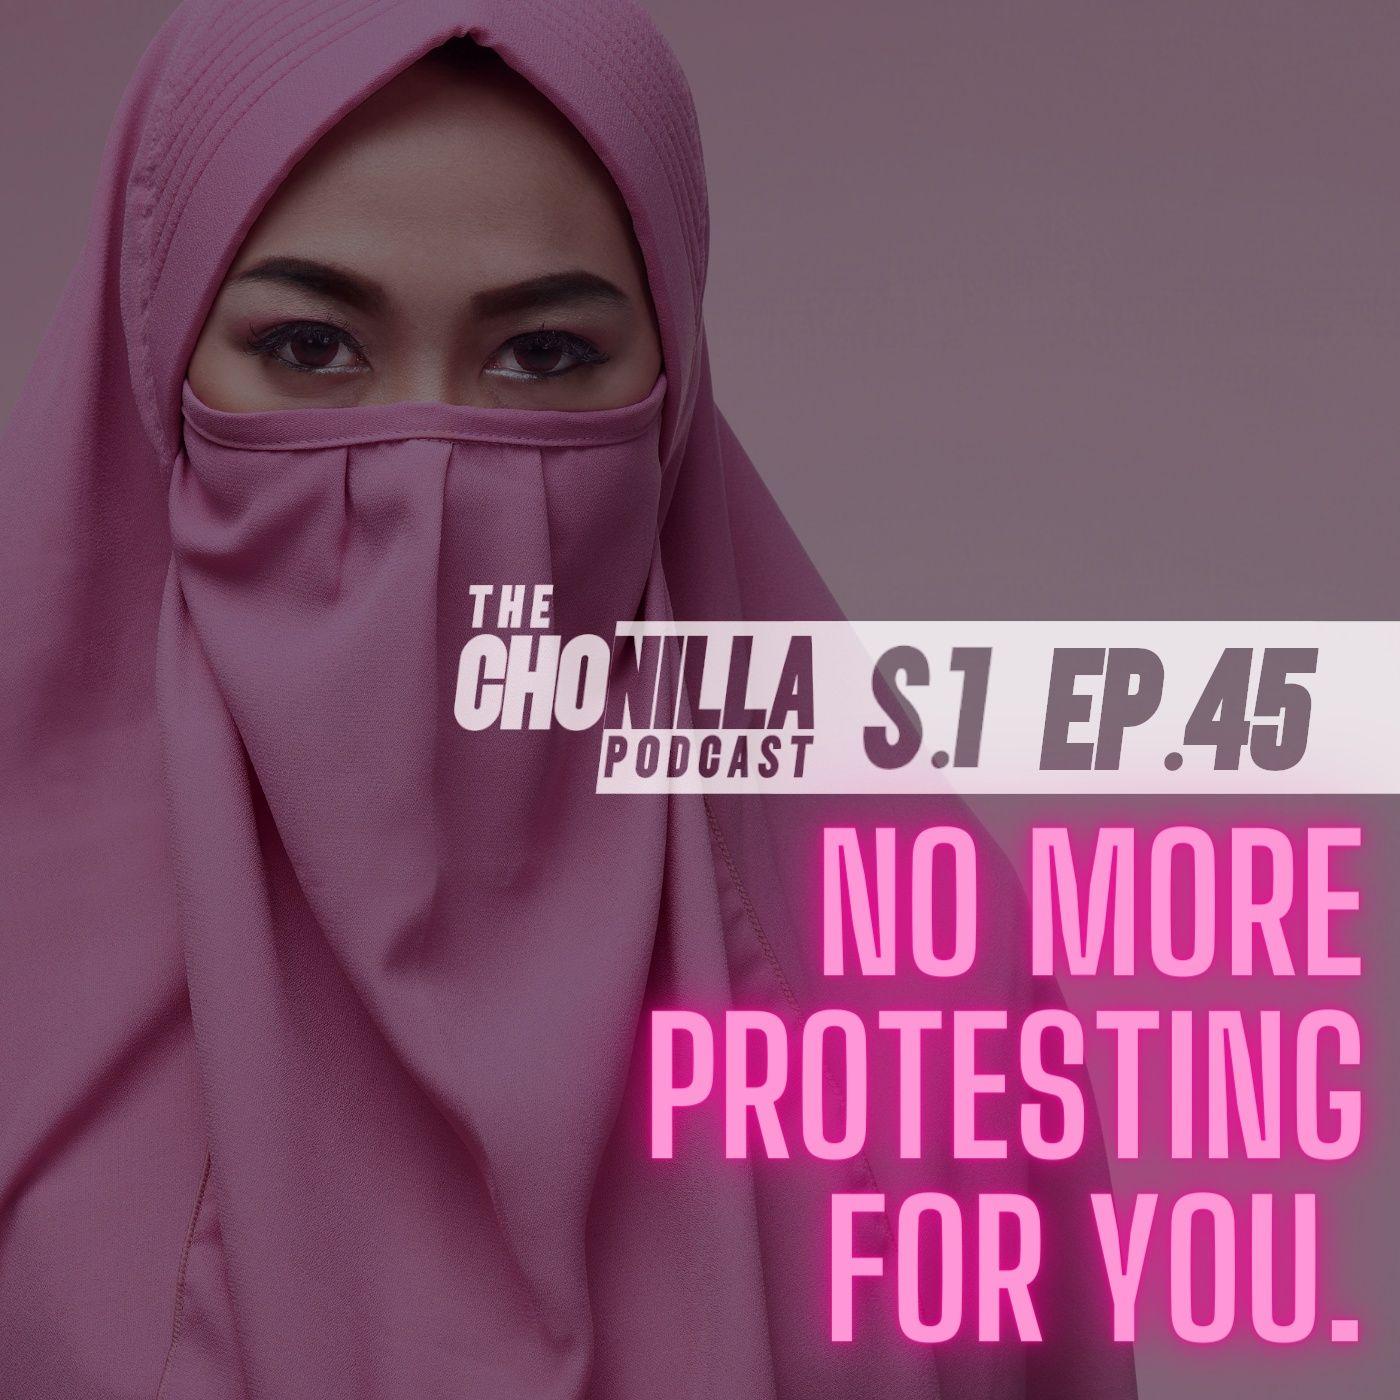 No more protesting for you